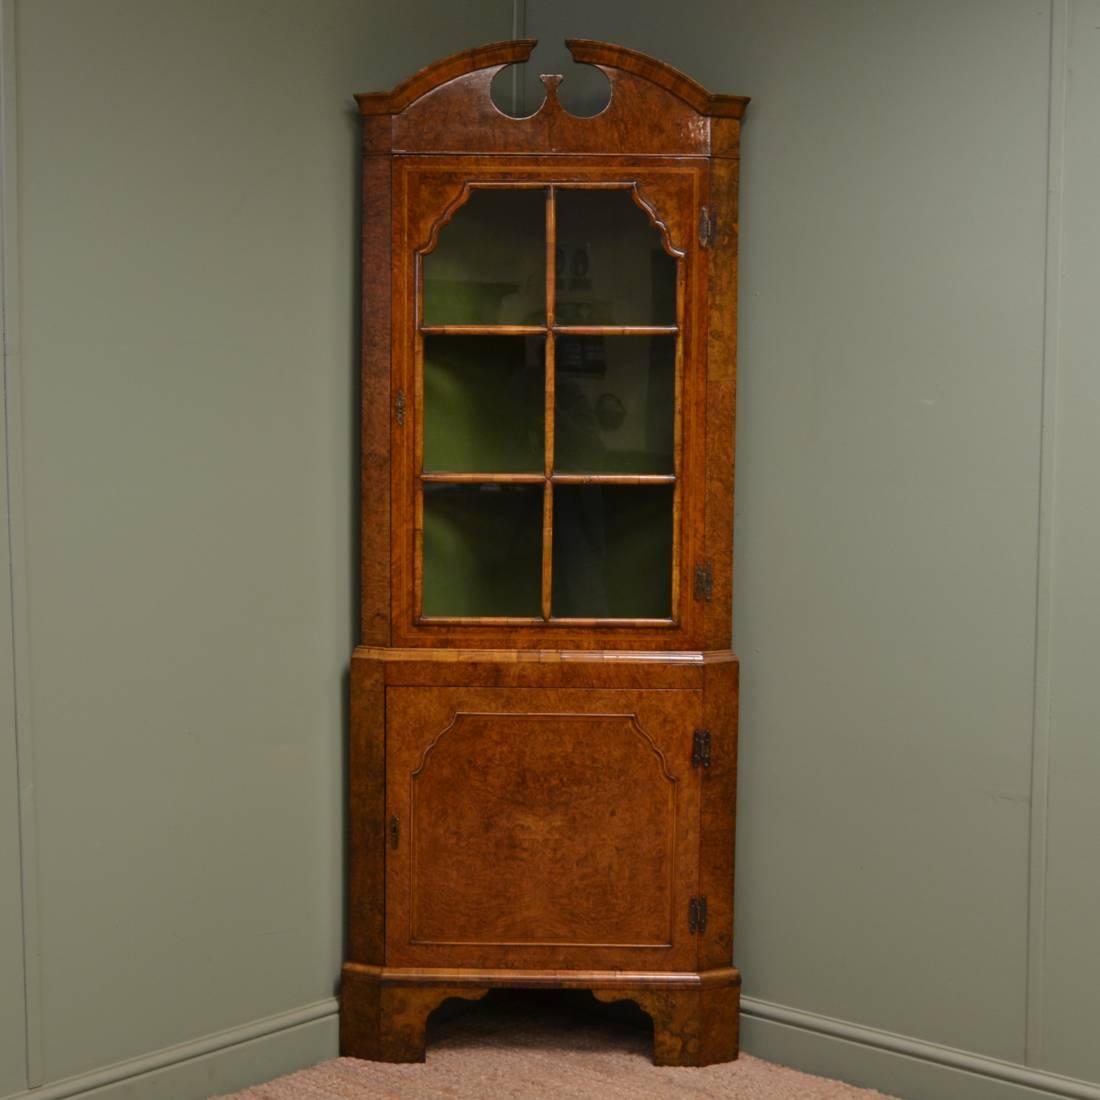 Figured Burr Walnut Antique Edwardian Antique Corner Cabinet